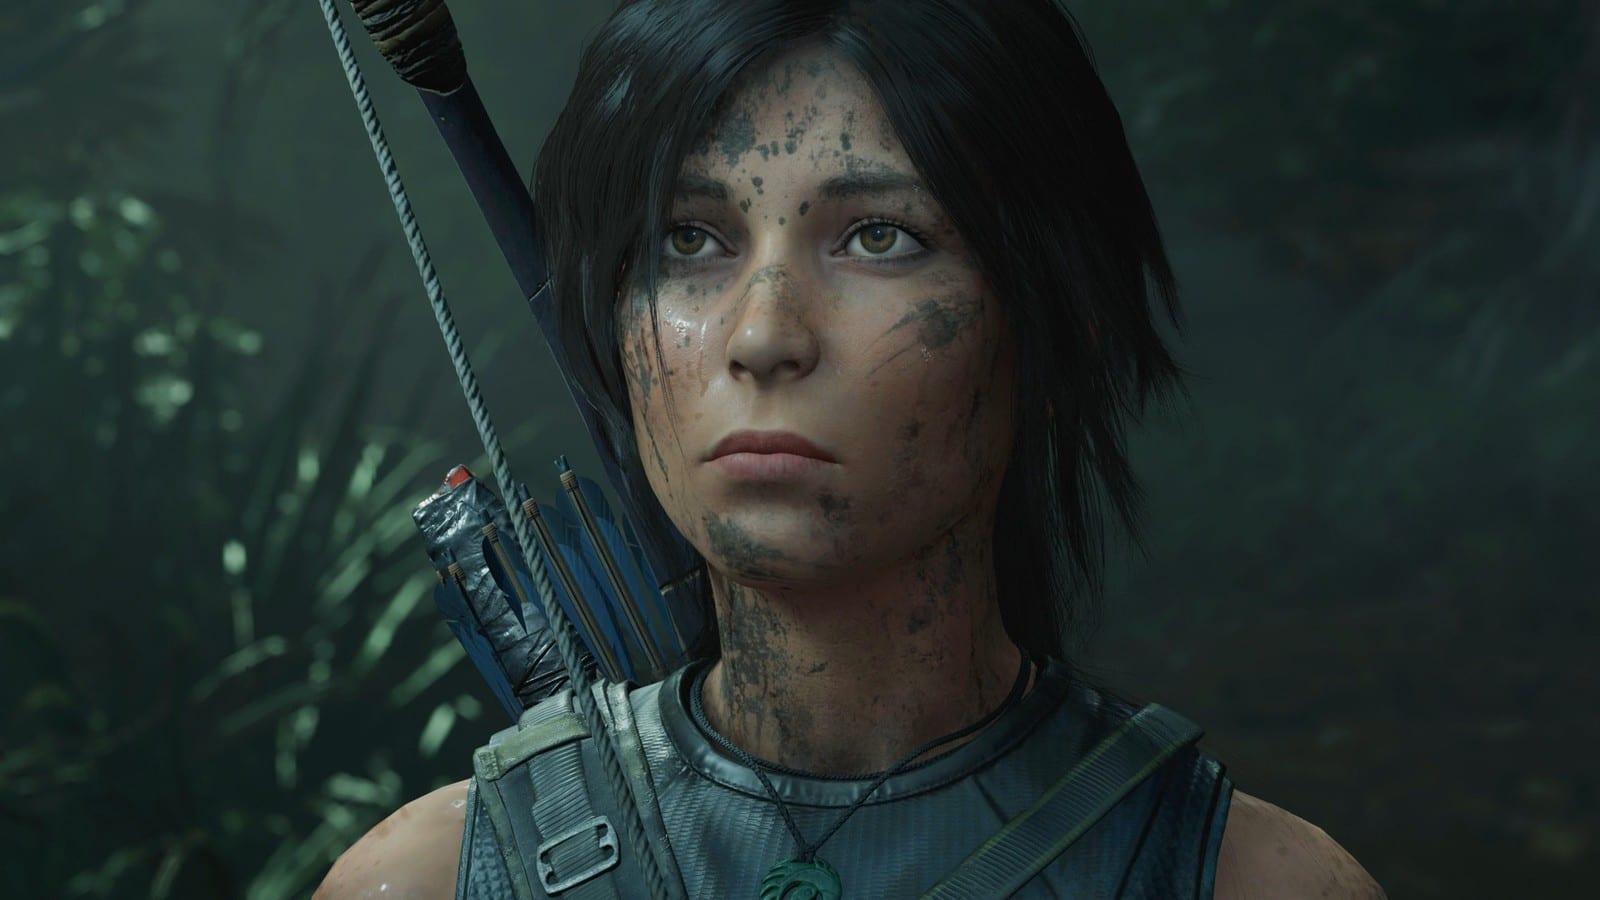 Lara Croft - Shadow of the Tomb Raider (Xbox One X)